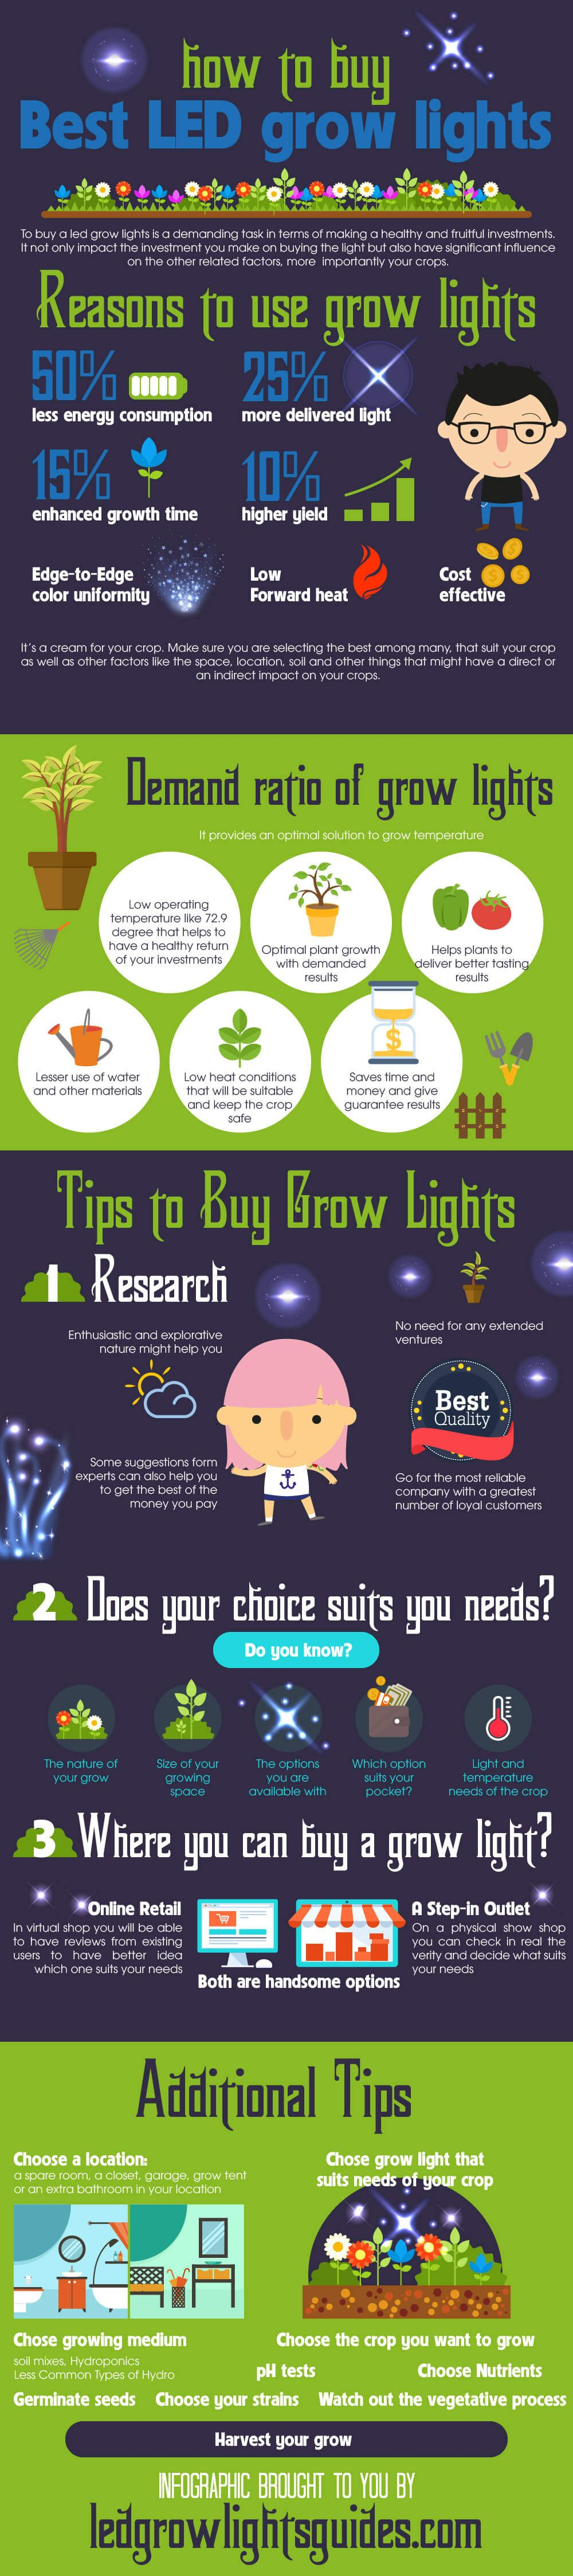 Led Grow Light In Depth Information Aquaponics Grow